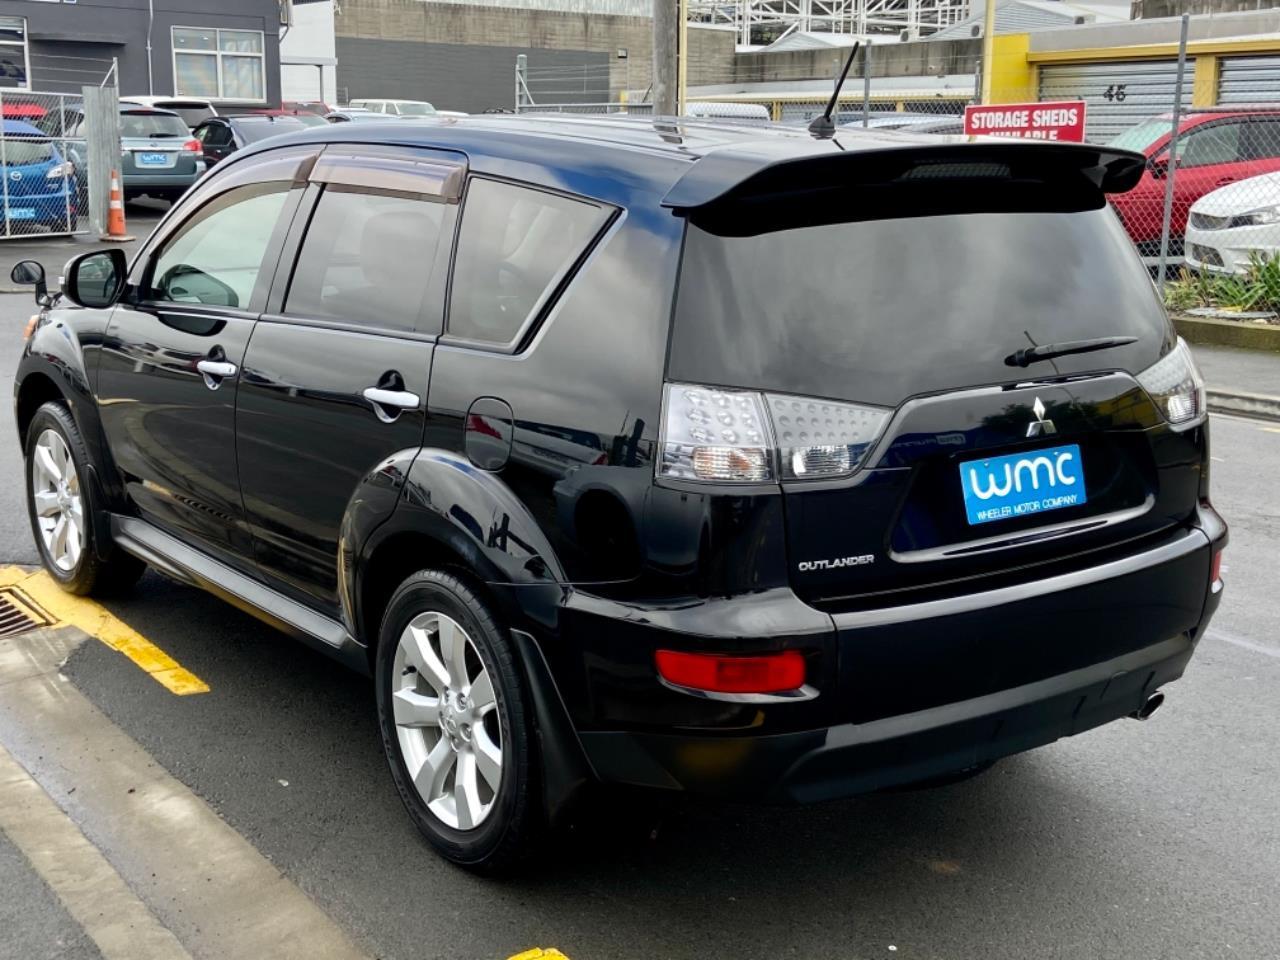 image-9, 2010 Mitsubishi Outlander 24G 4WD 7 Seater Facelif at Christchurch